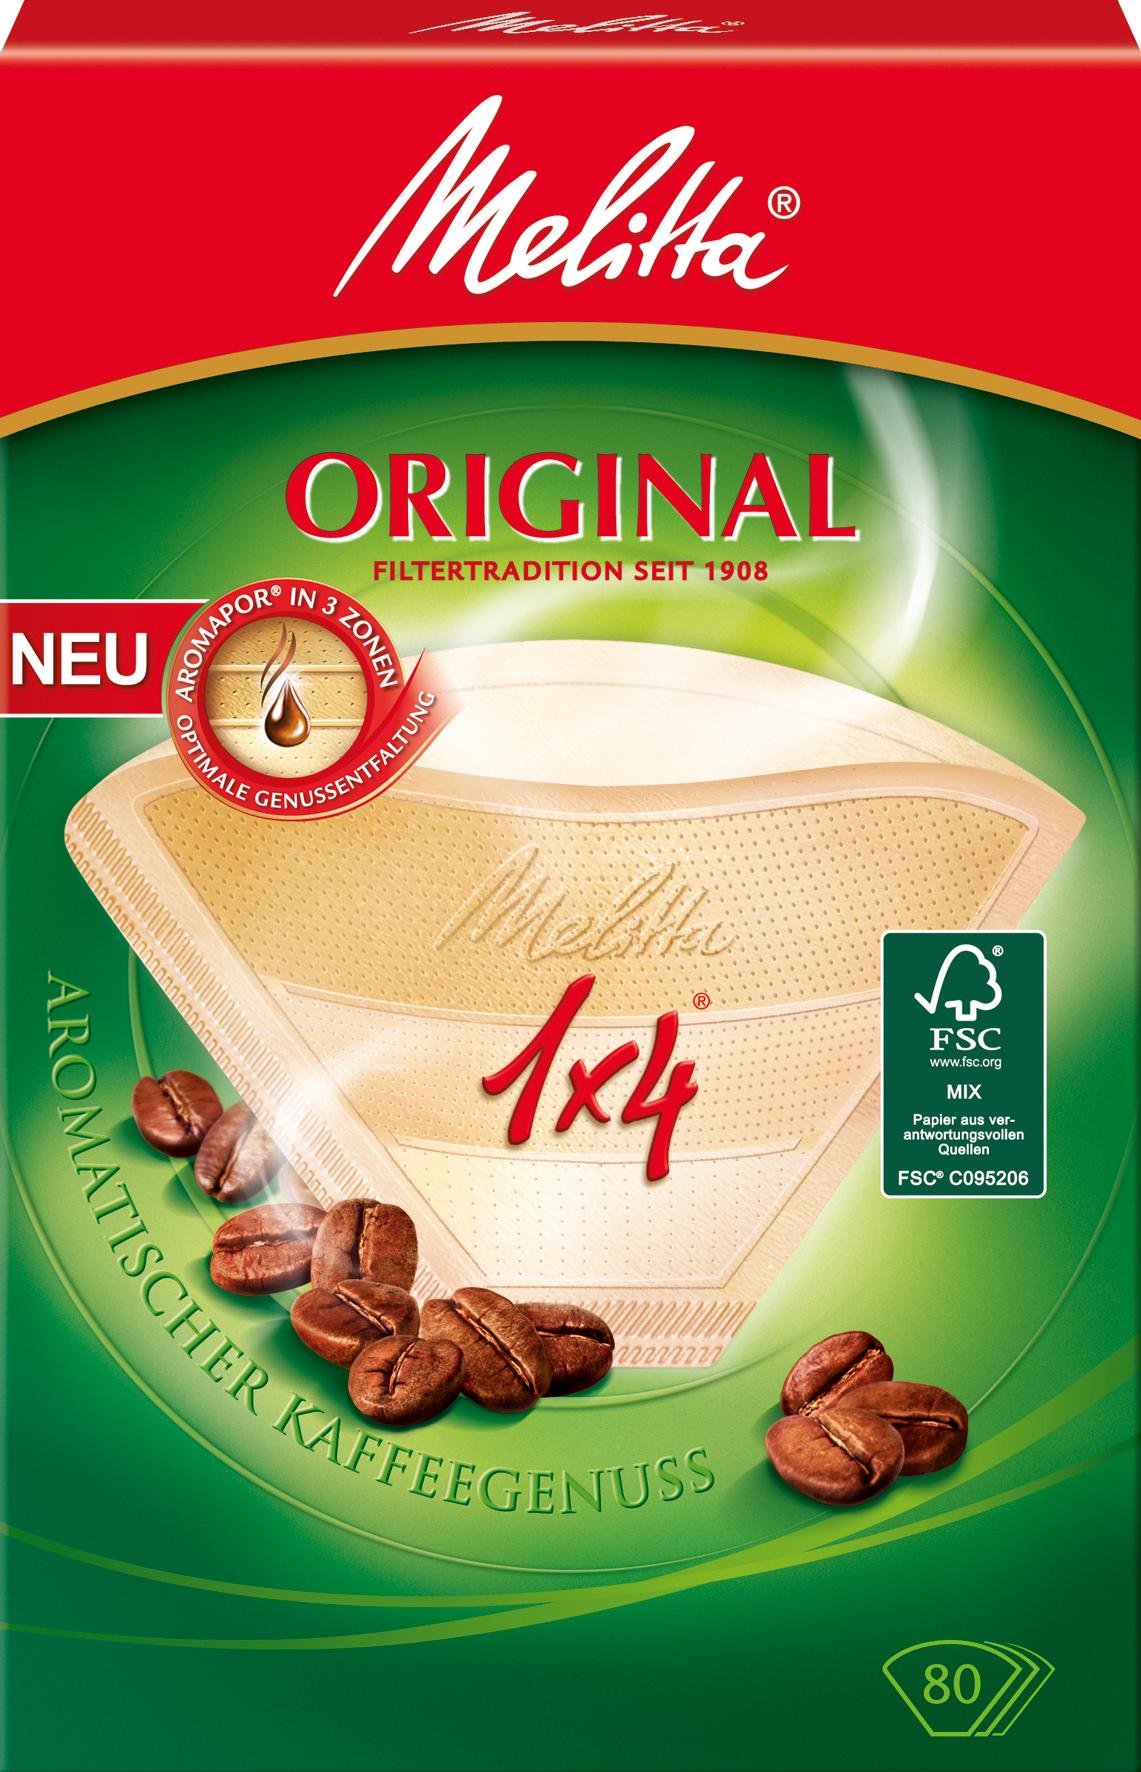 Melitta Kaffeefiltertüten, 1 x 4, naturbraun, 80 Stück, für sanftes, harmonisches Aroma